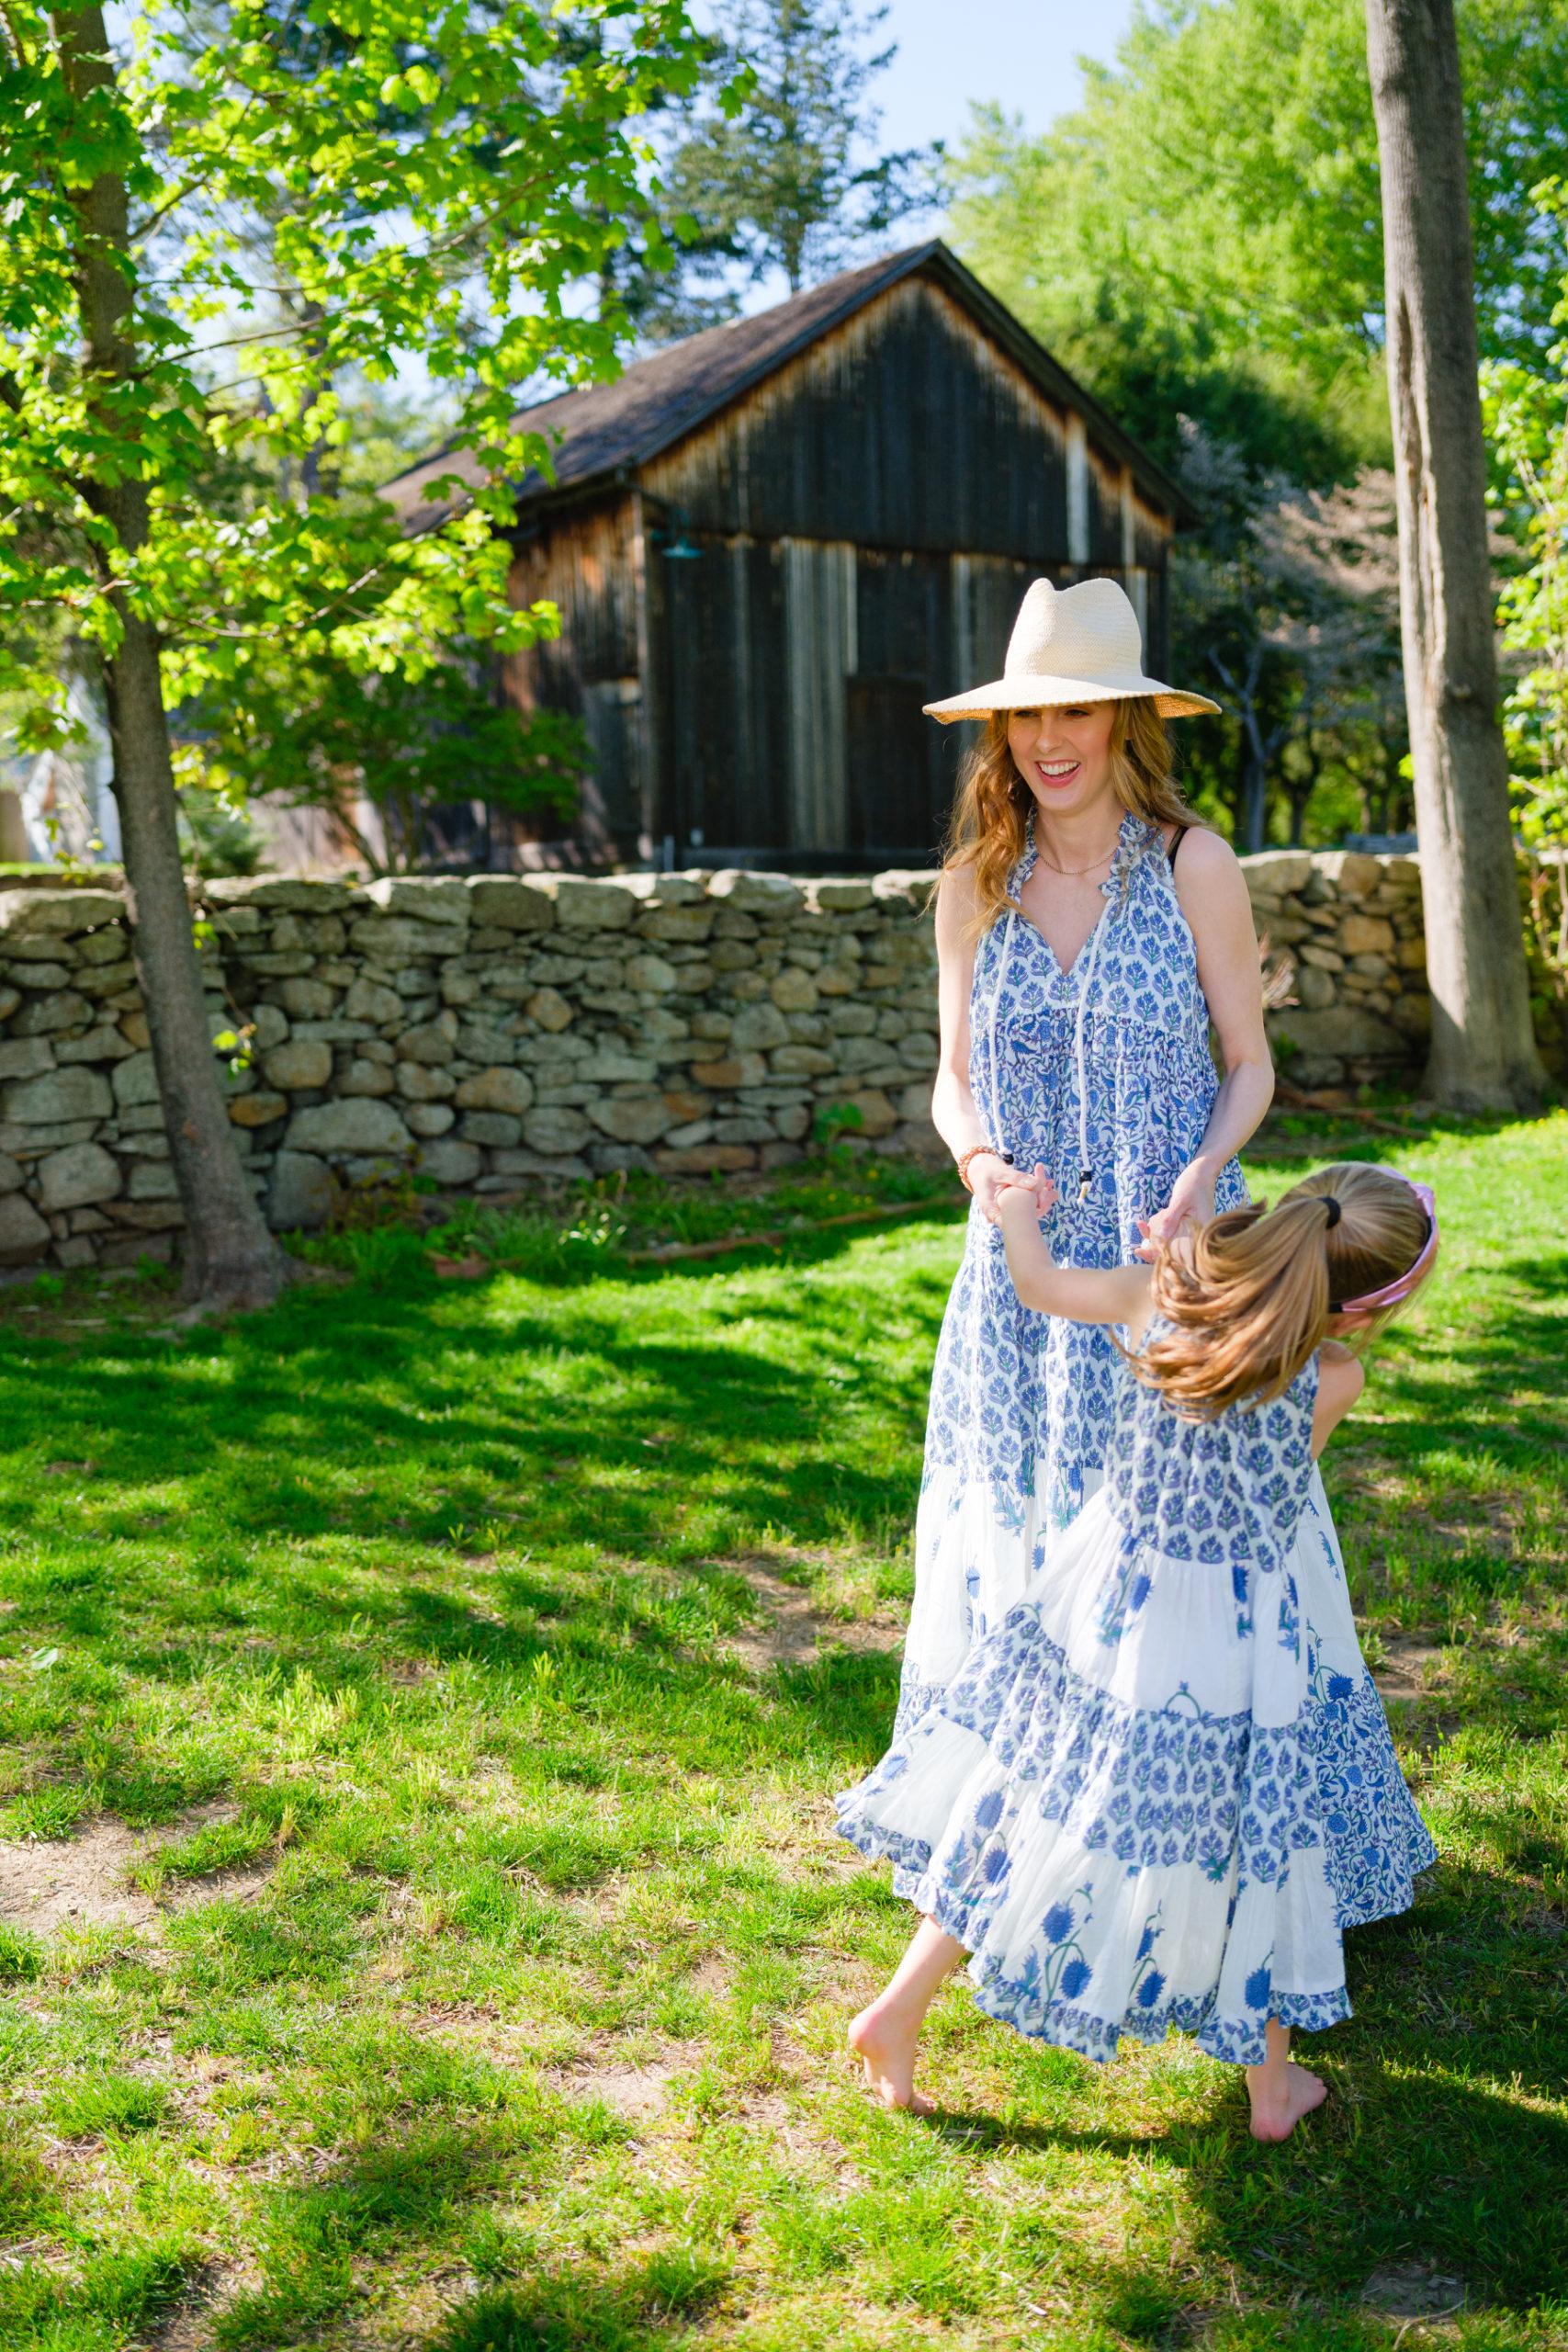 Eva Amurri shares an update on daughter Marlowe's anxiety